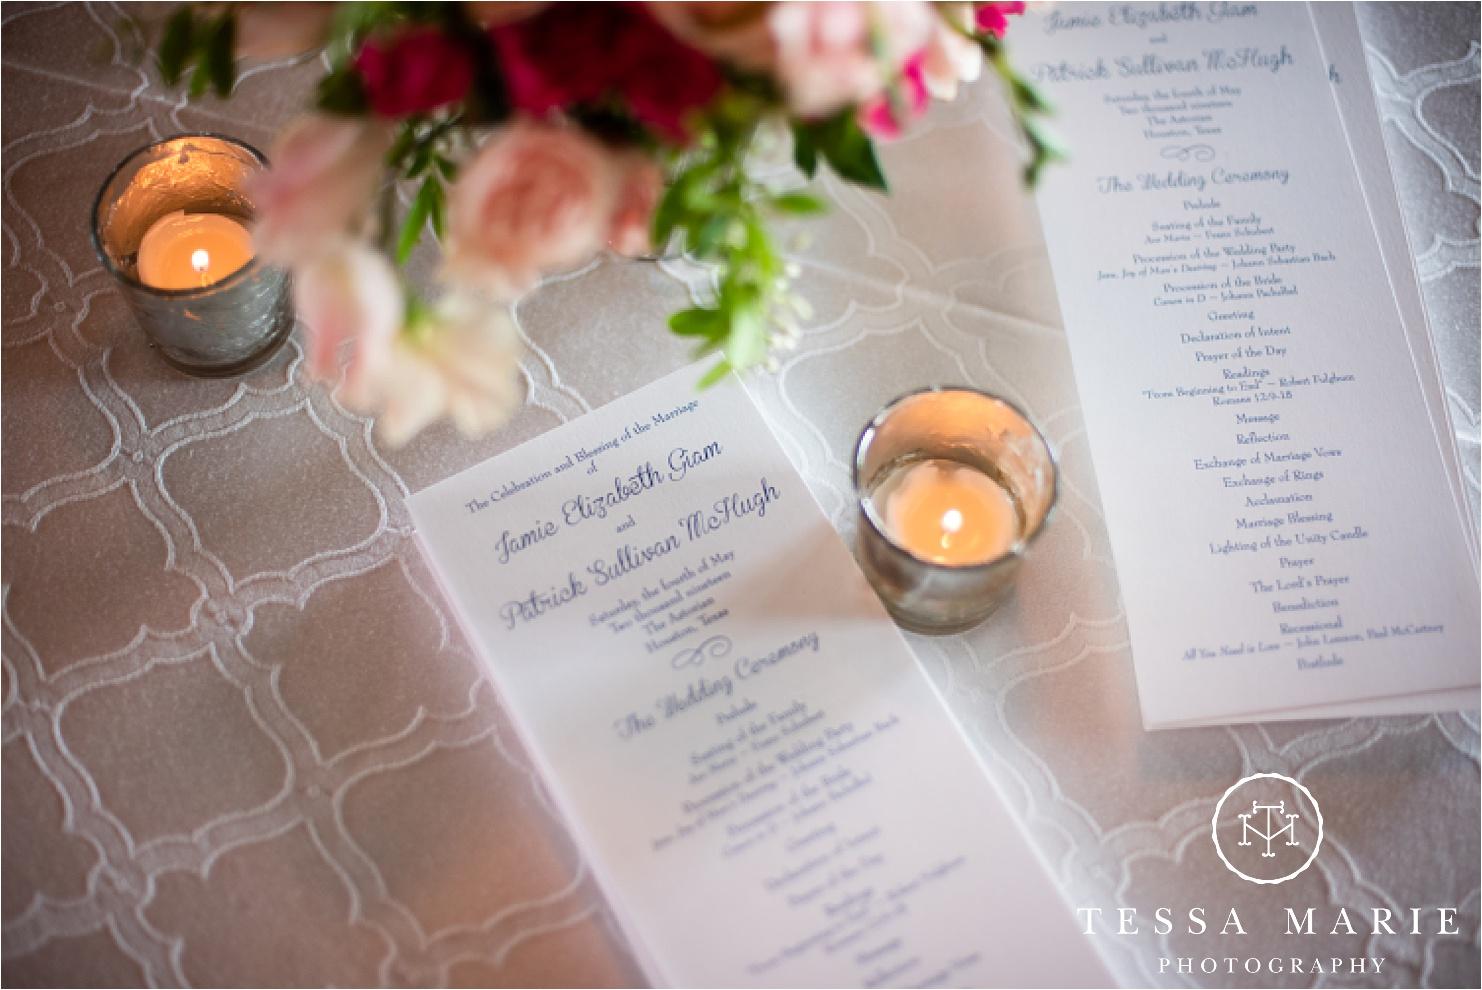 Tessa_marie_weddings_houston_wedding_photographer_The_astorian_0102.jpg